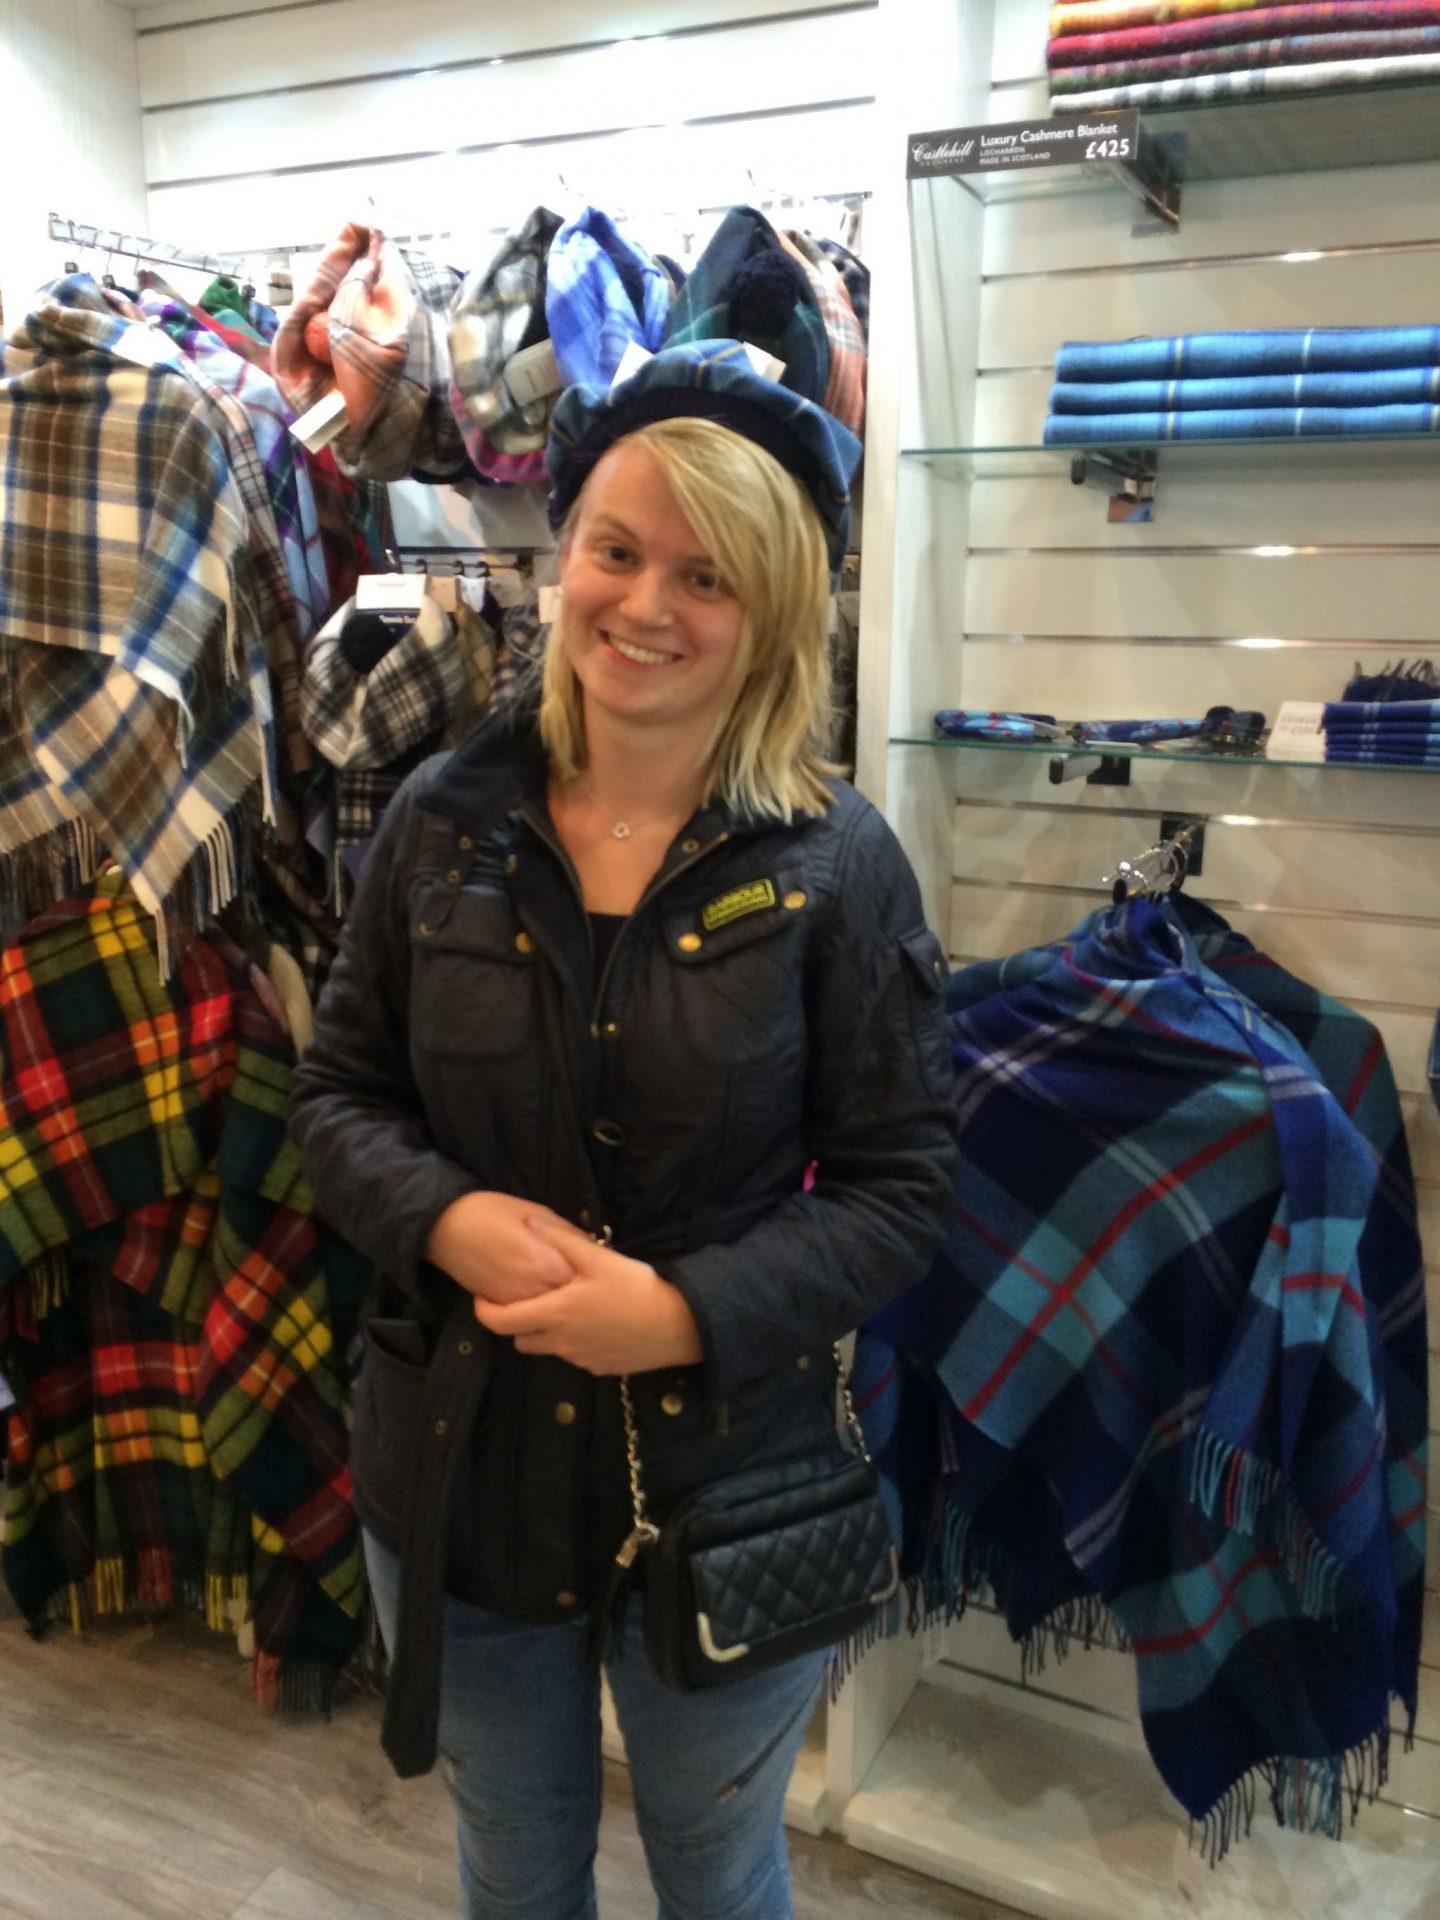 Laura wearing a tam o' shanter in Edinburgh